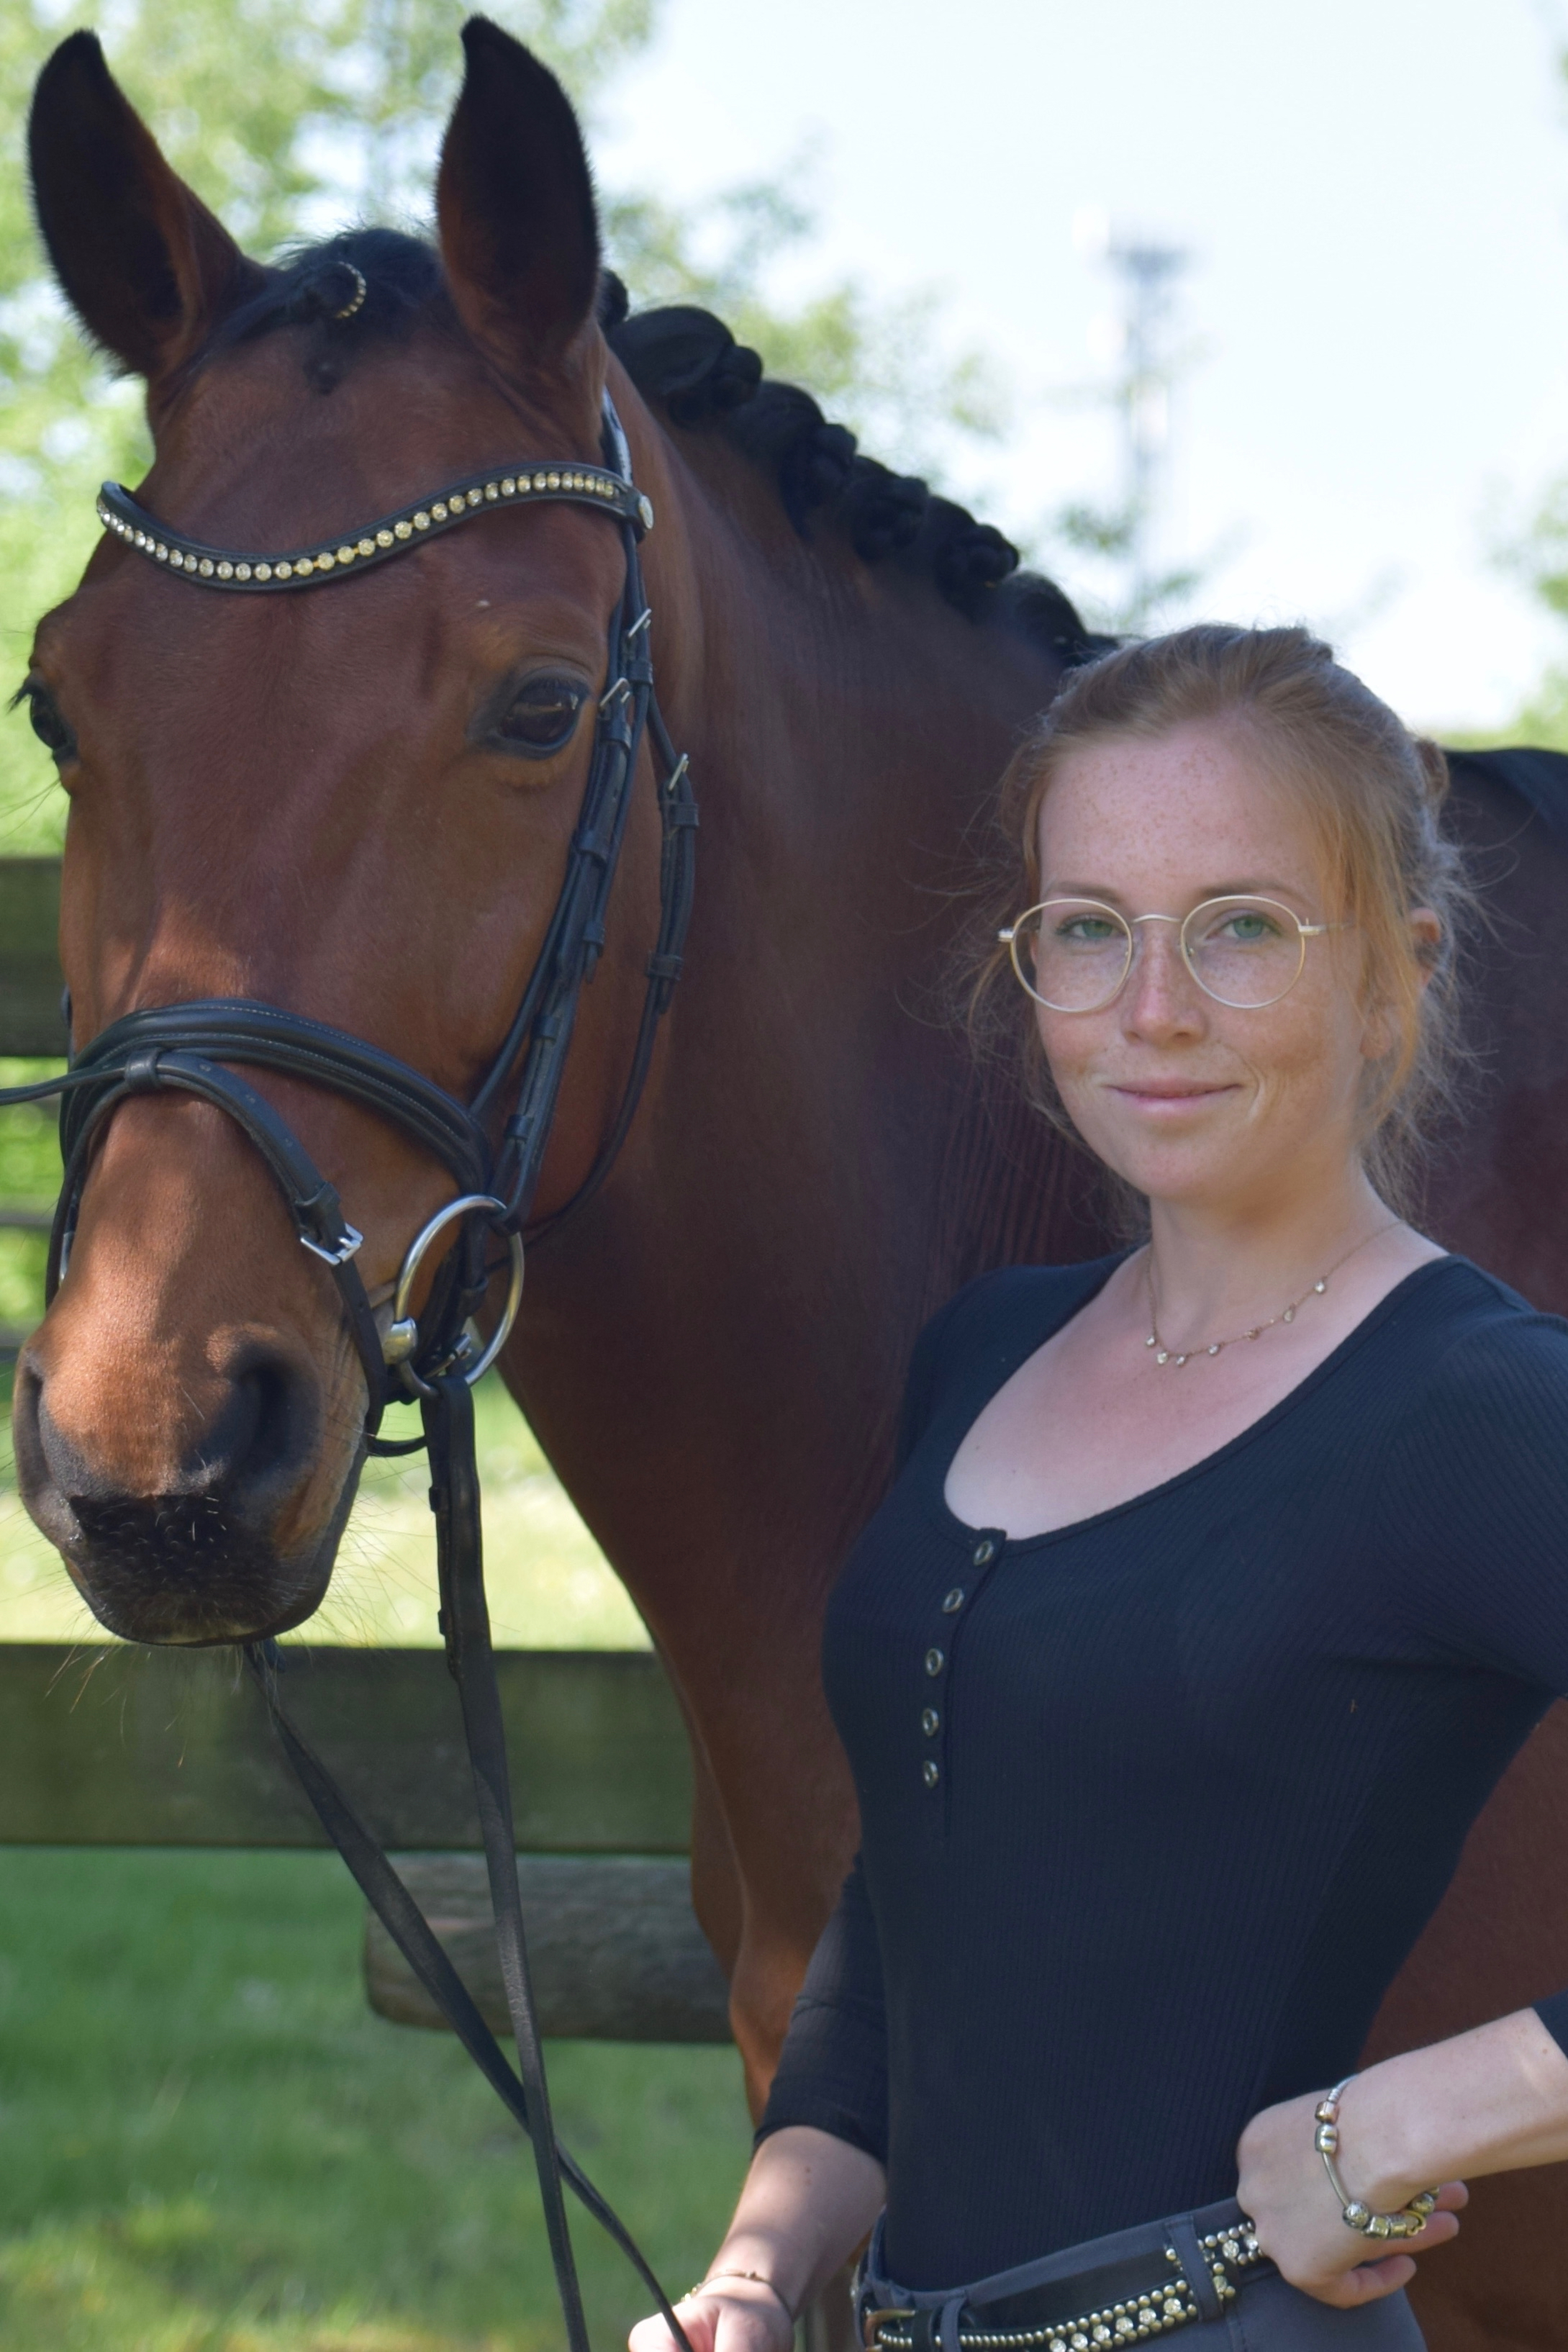 Ronja Brüggemann, 3. Platz Bachelor im GWP-Förderpreis 2020. Foto: privat